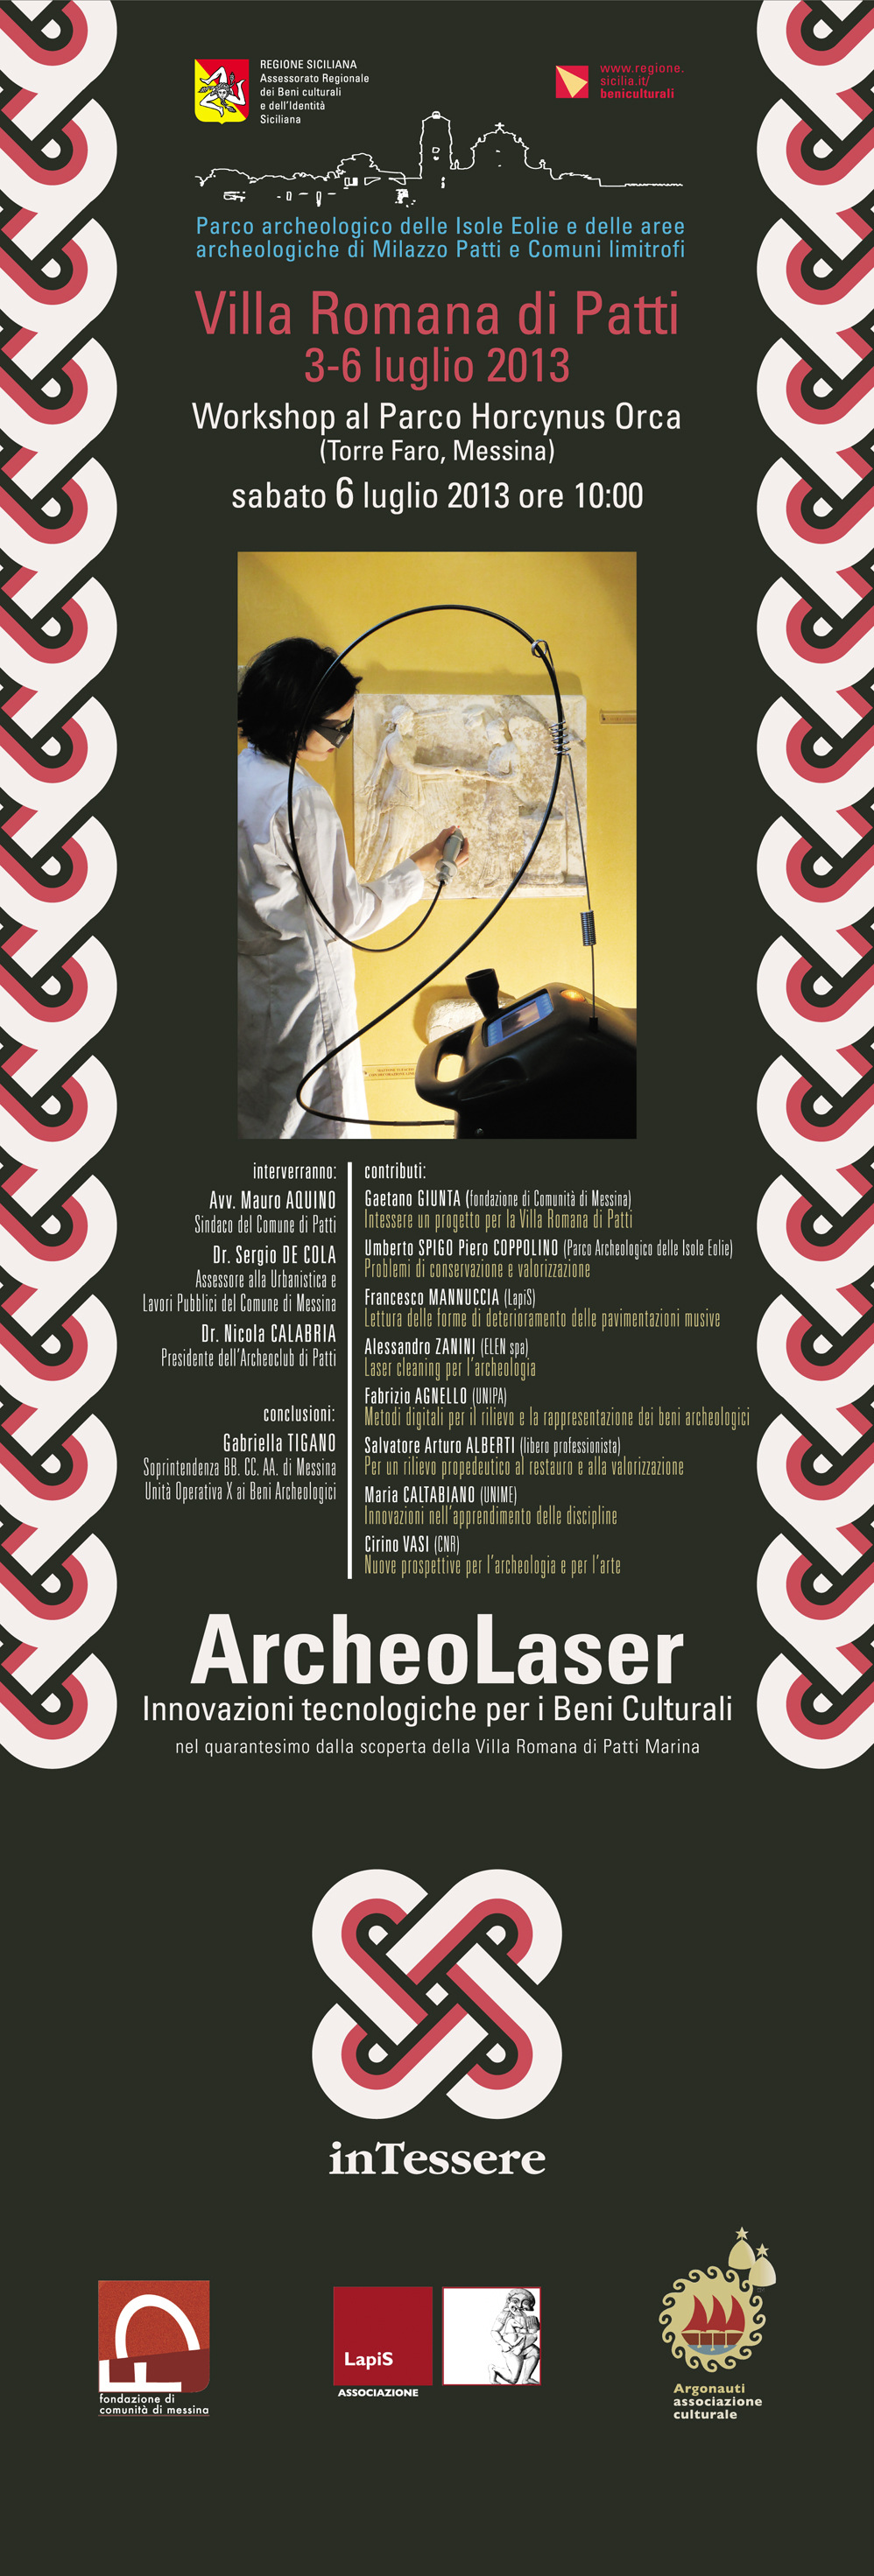 ArcheoLaser locandina